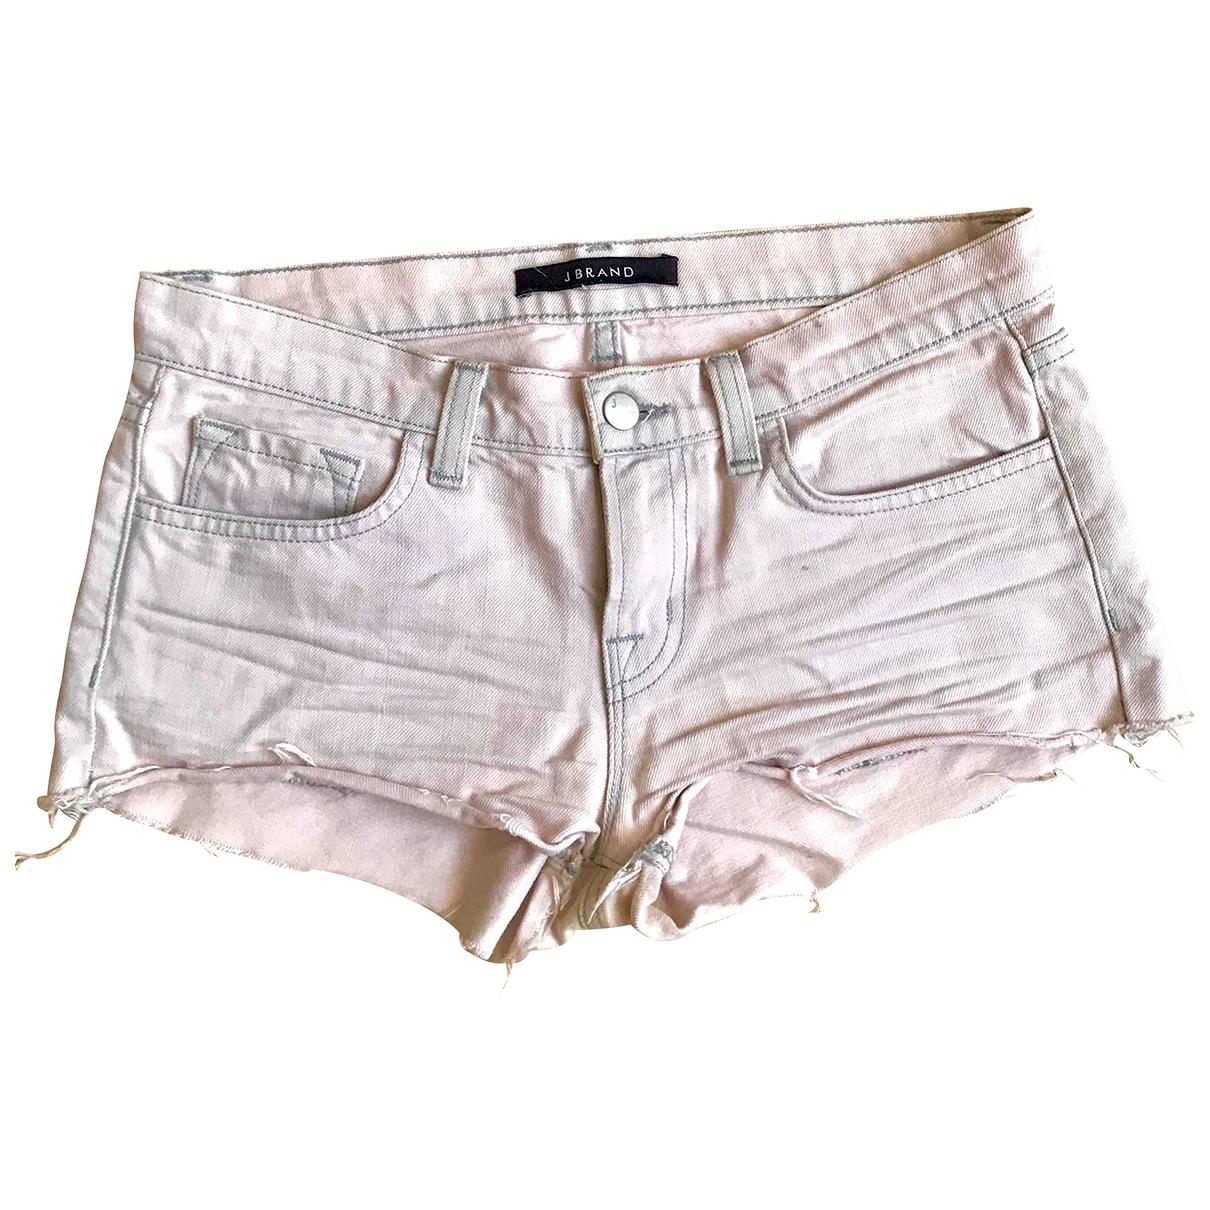 J Brand \N Pink Denim - Jeans Shorts for Women XS International